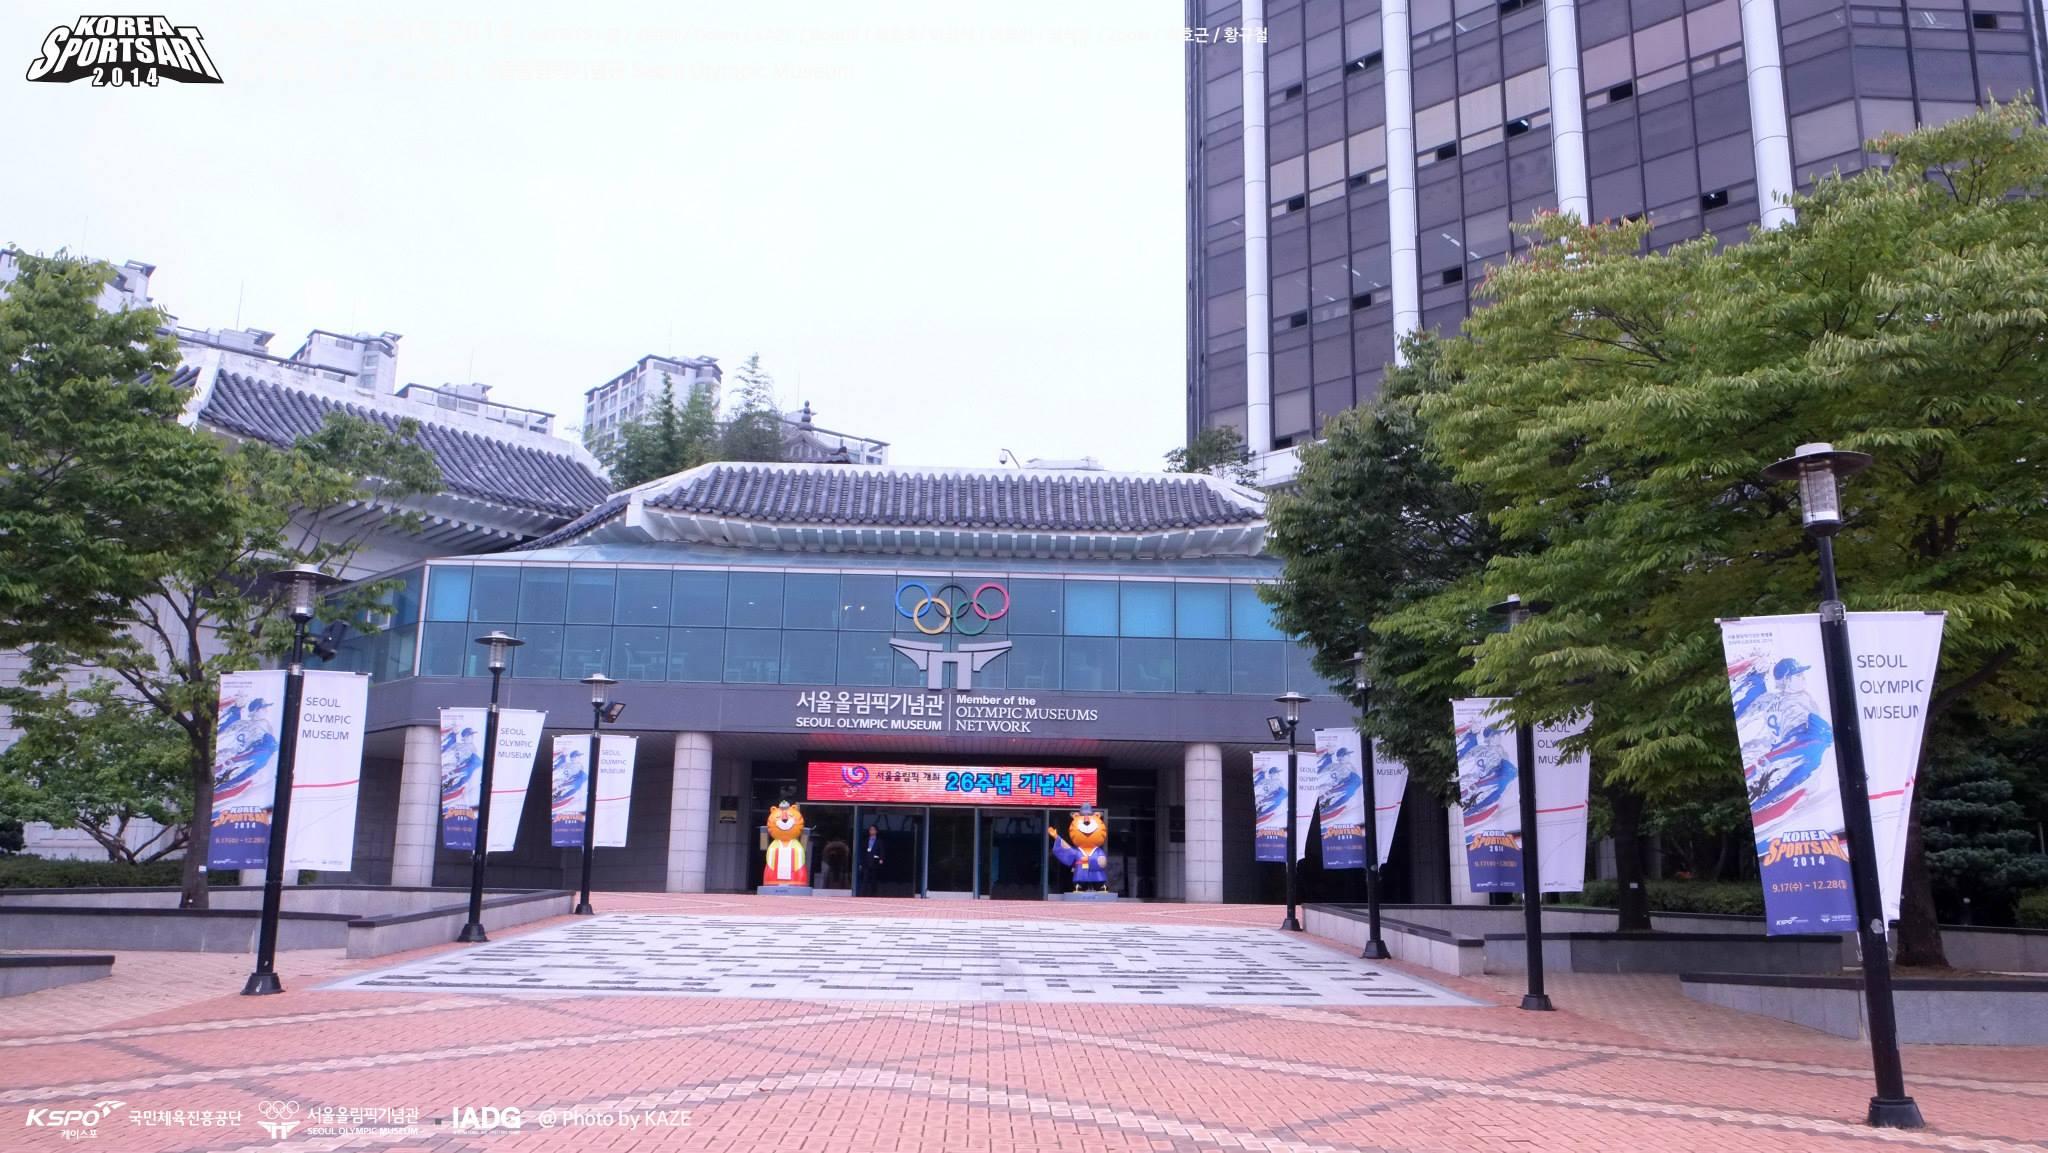 SEOUL OLYMPIC